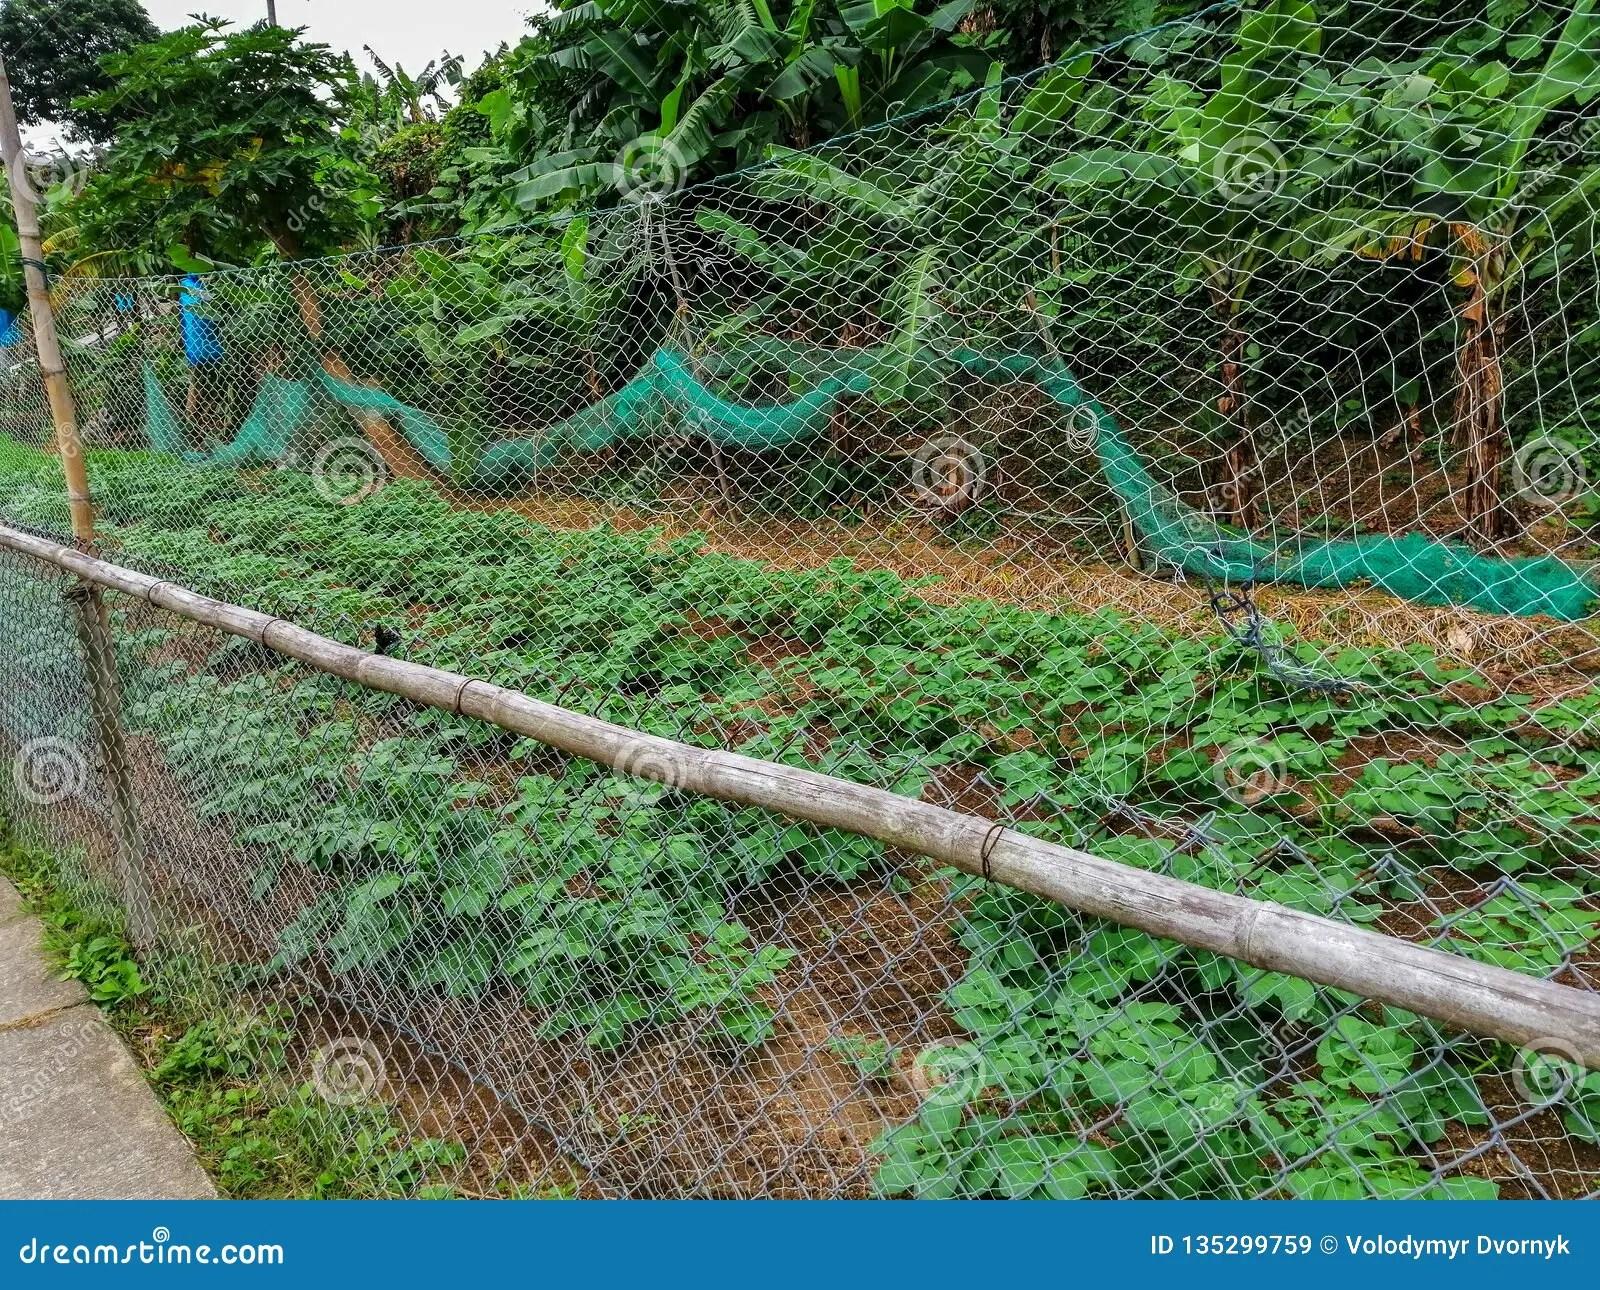 An Organic Farm On The Lantau Island. Hong Kong Stock Image - Image of cultivation. hong: 135299759